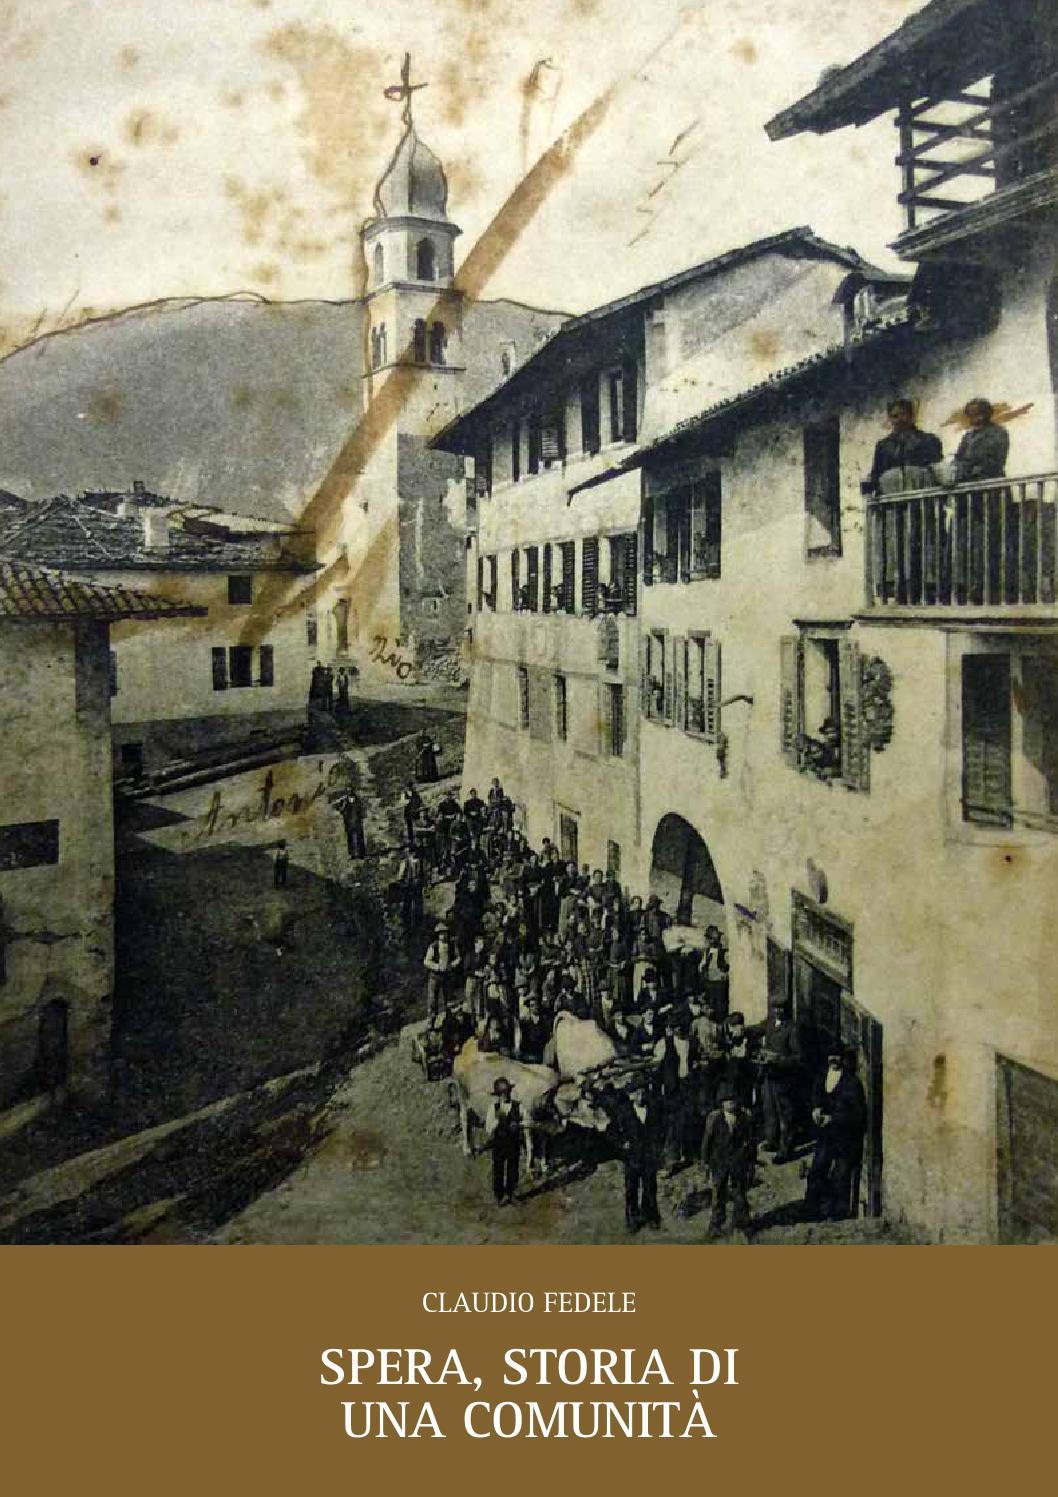 spera storia di una comunit by ecomuseo valsugana issuu